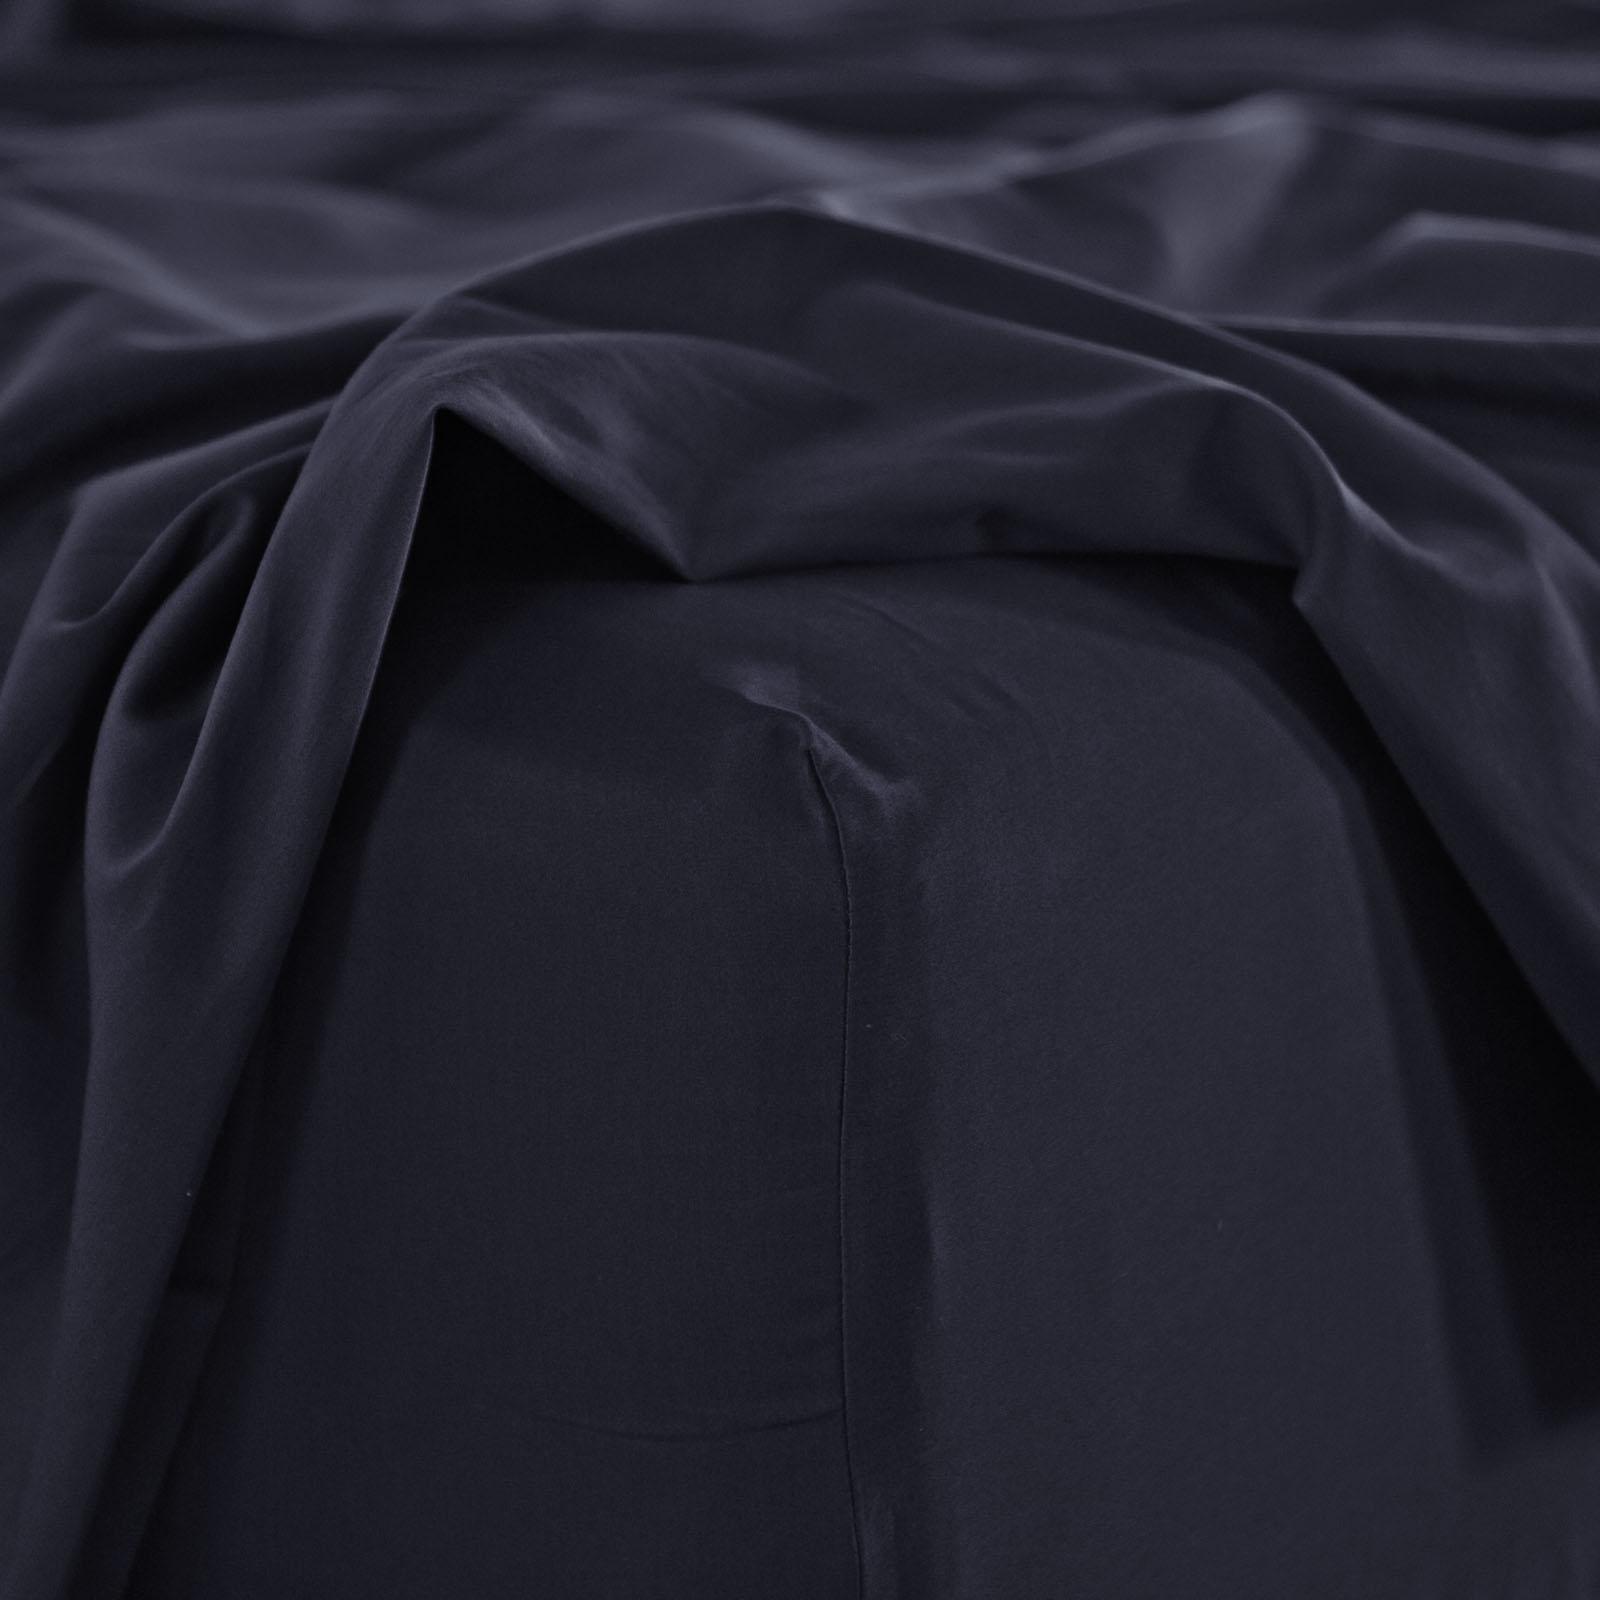 thumbnail 28 - Royal Comfort 1000TC Hotel Grade Bamboo Cotton Sheets Pillowcases Set Ultrasoft